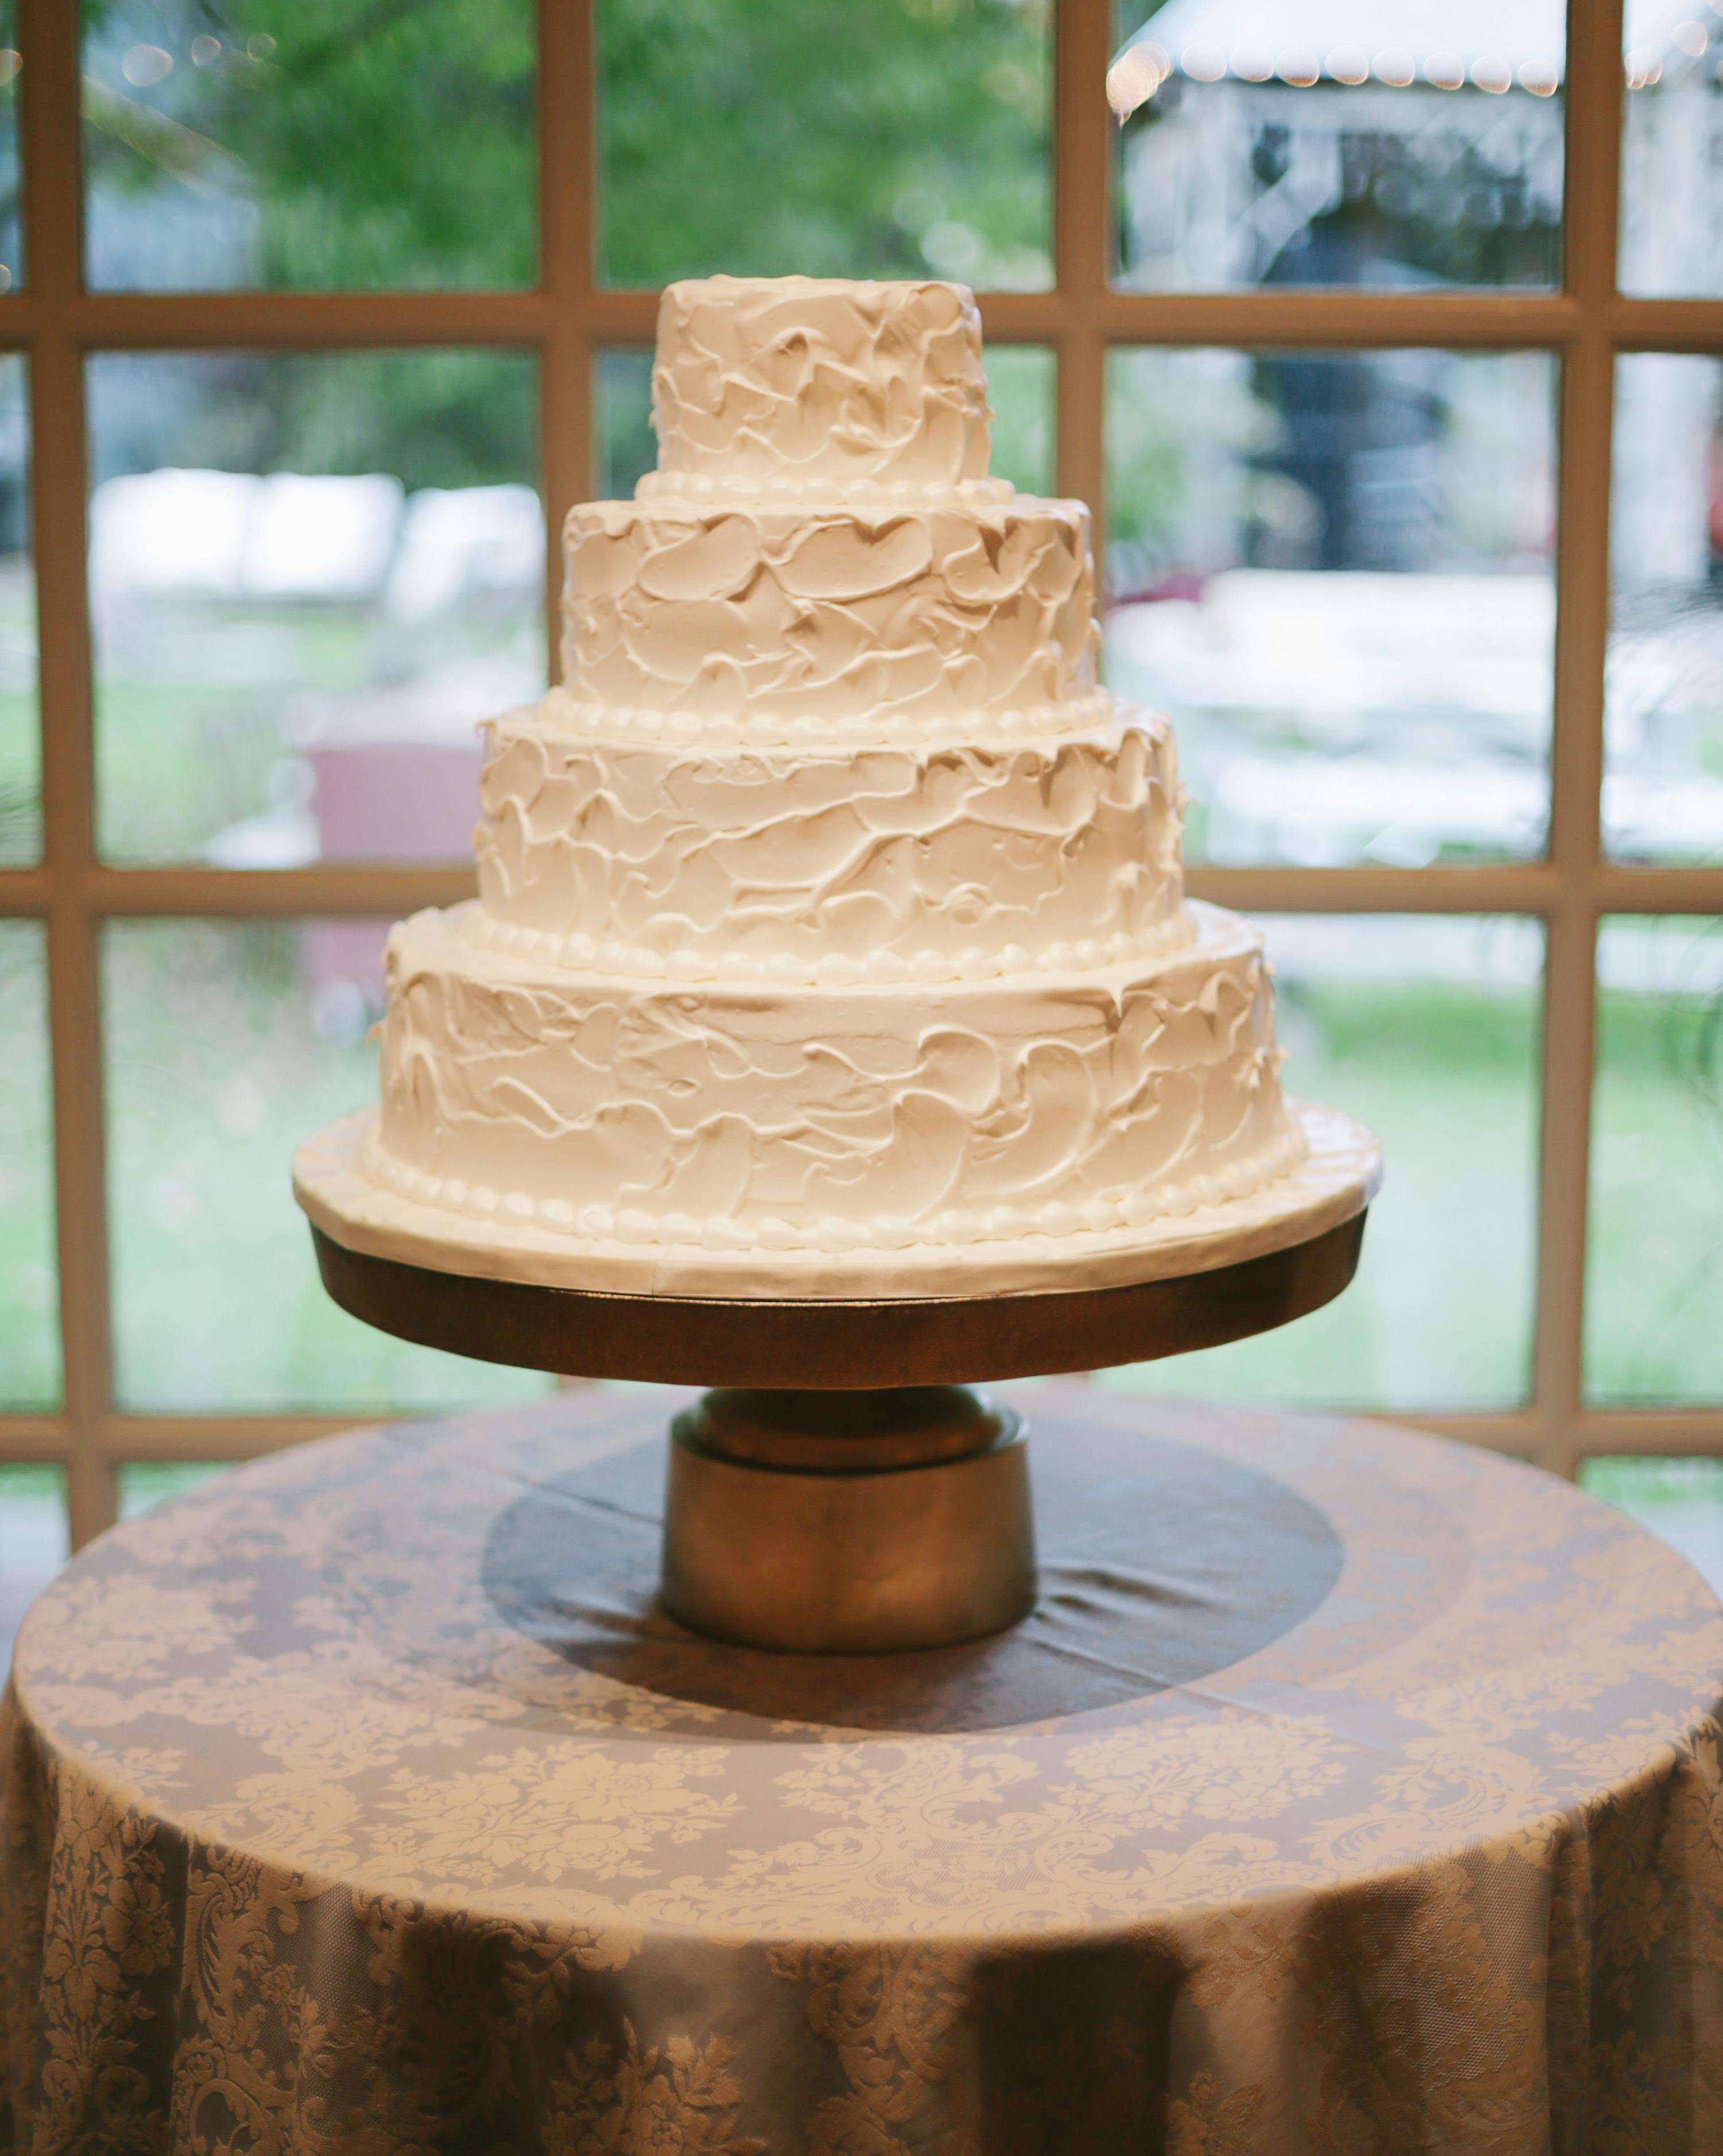 destiny-taylor-wedding-cake-334-s112347-1115.jpg